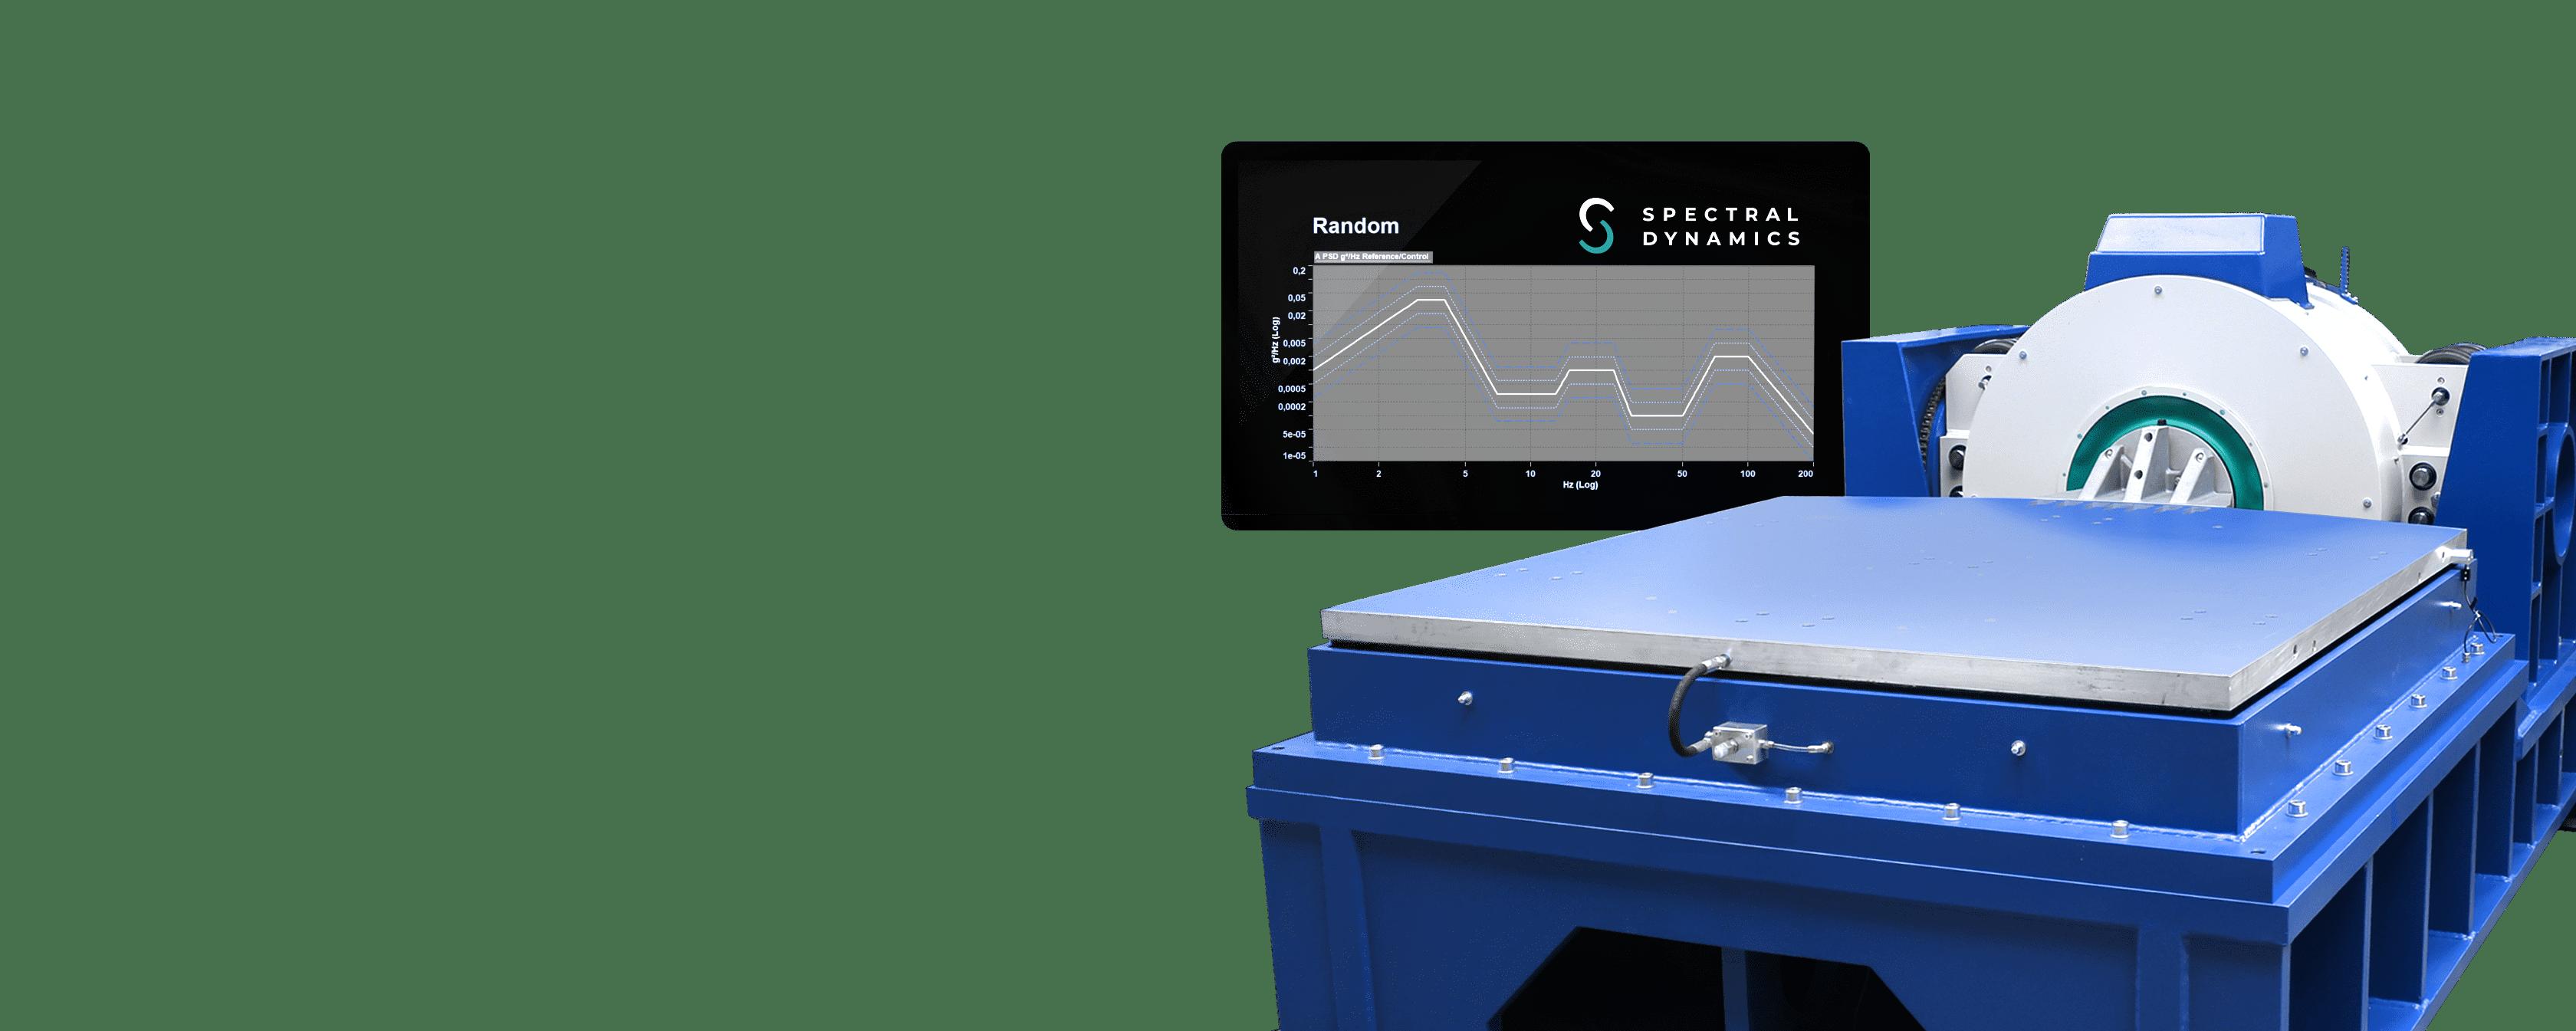 Spectral Dynamics - Tira